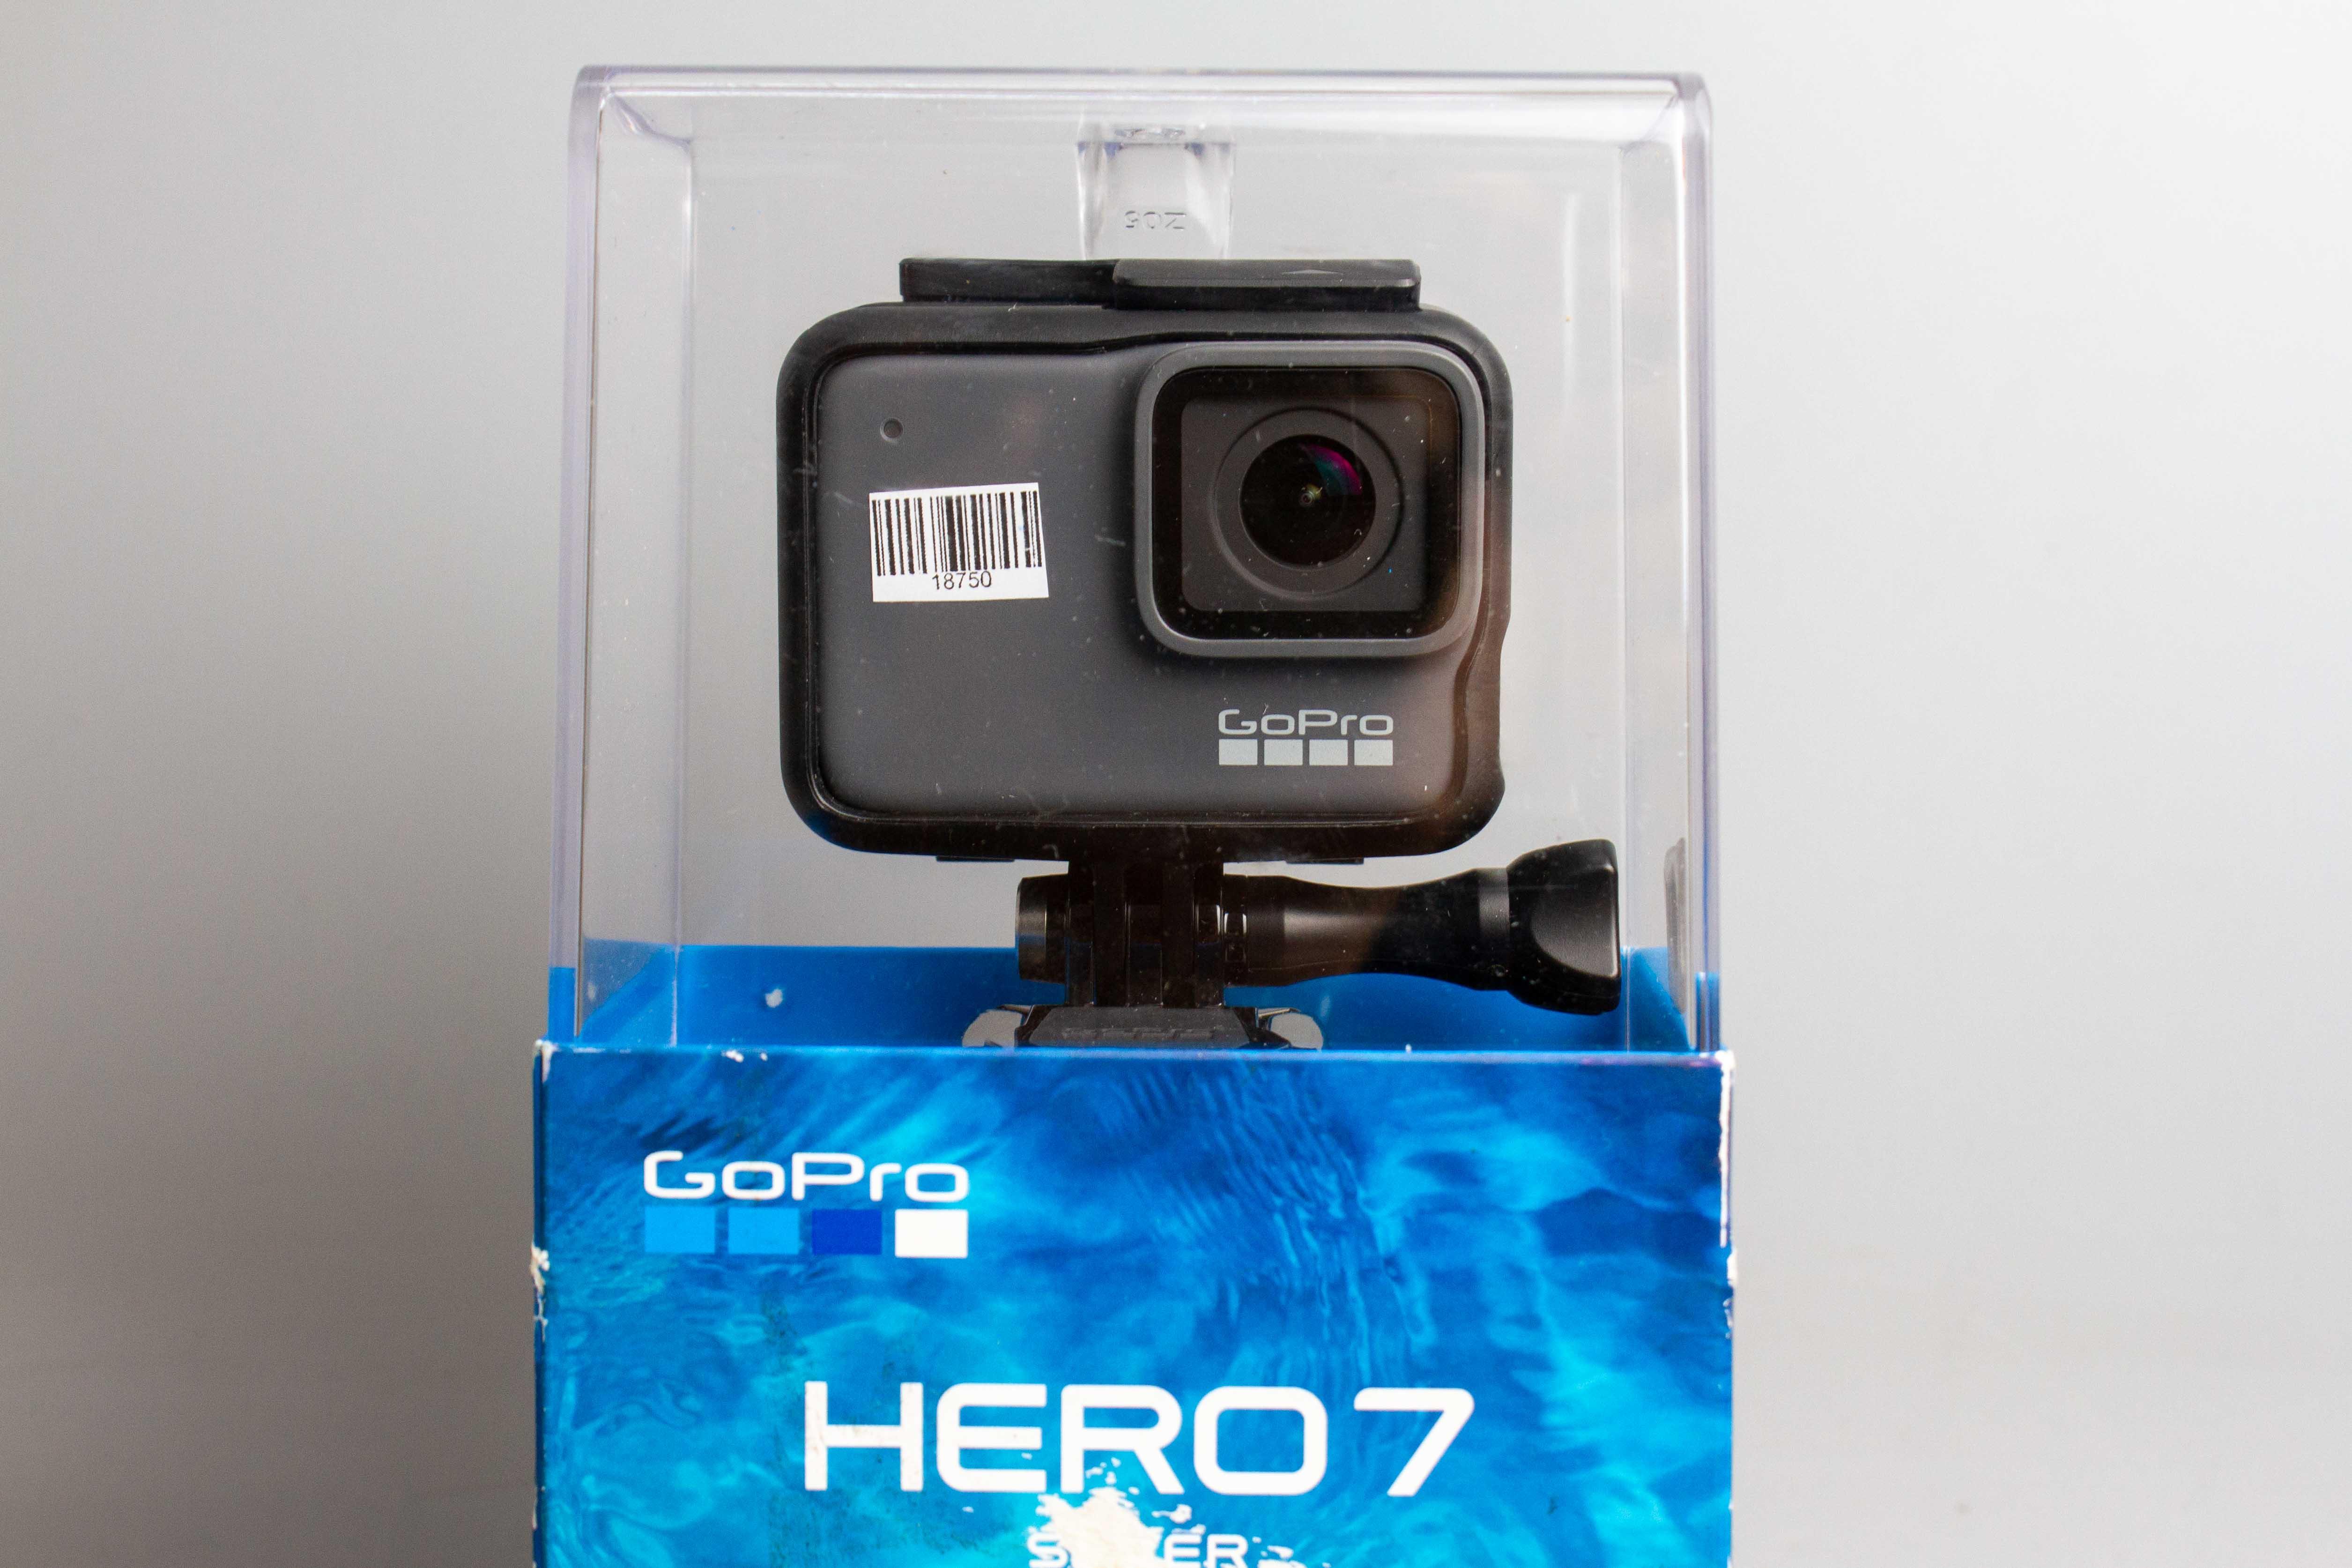 gopro-hero-7-silver-fullbox-18750